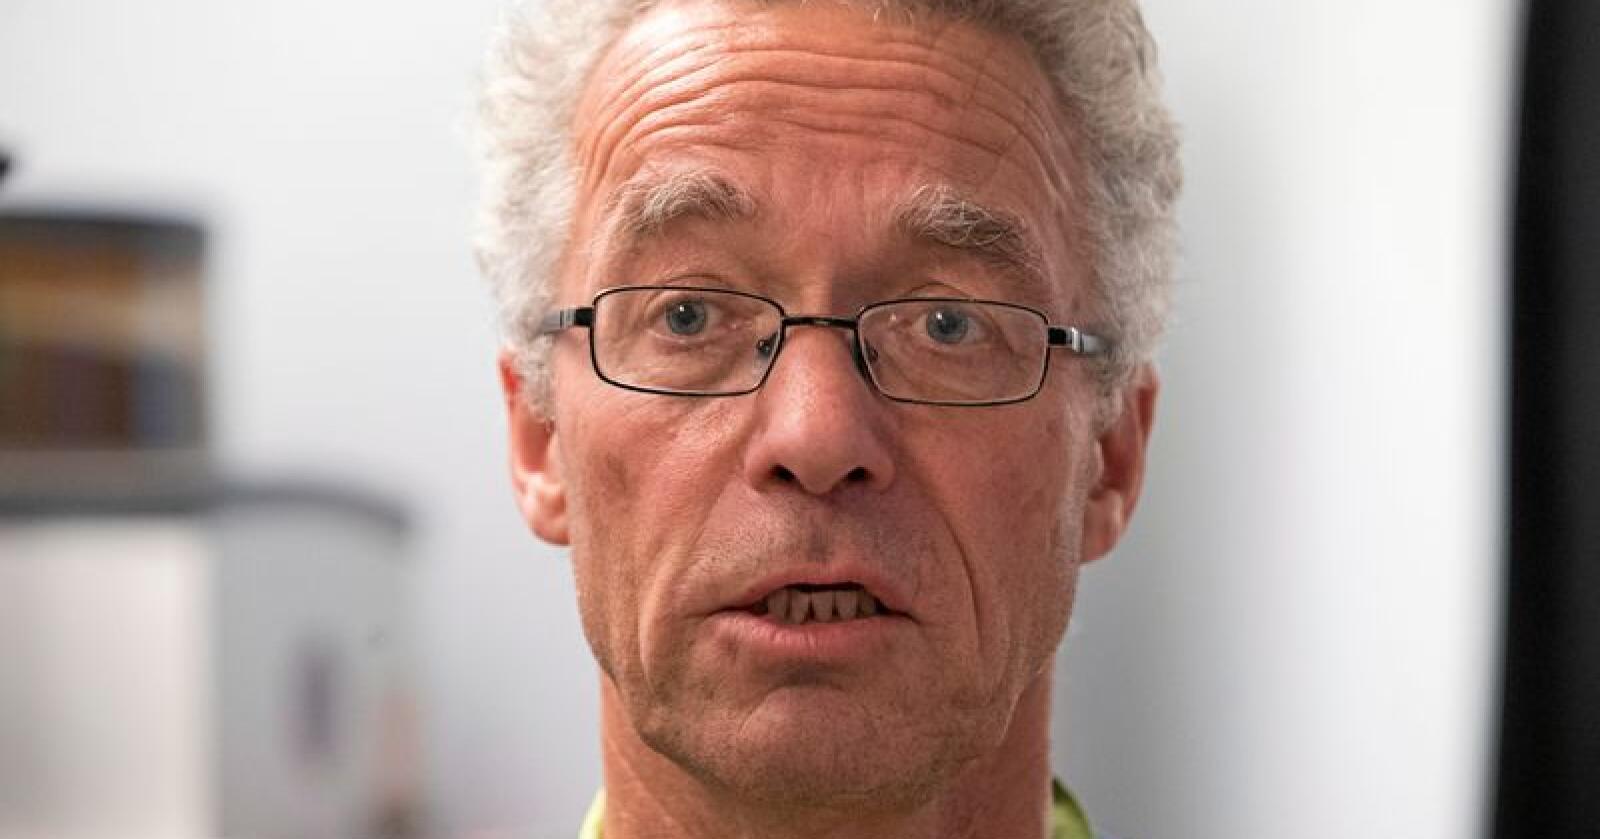 Rasmus Hansson skal være med på programarbeidet i Miljøpartiet De Grønne fram mot stortingsvalget i 2021. Foto: Terje Bendiksby / NTB scanpix